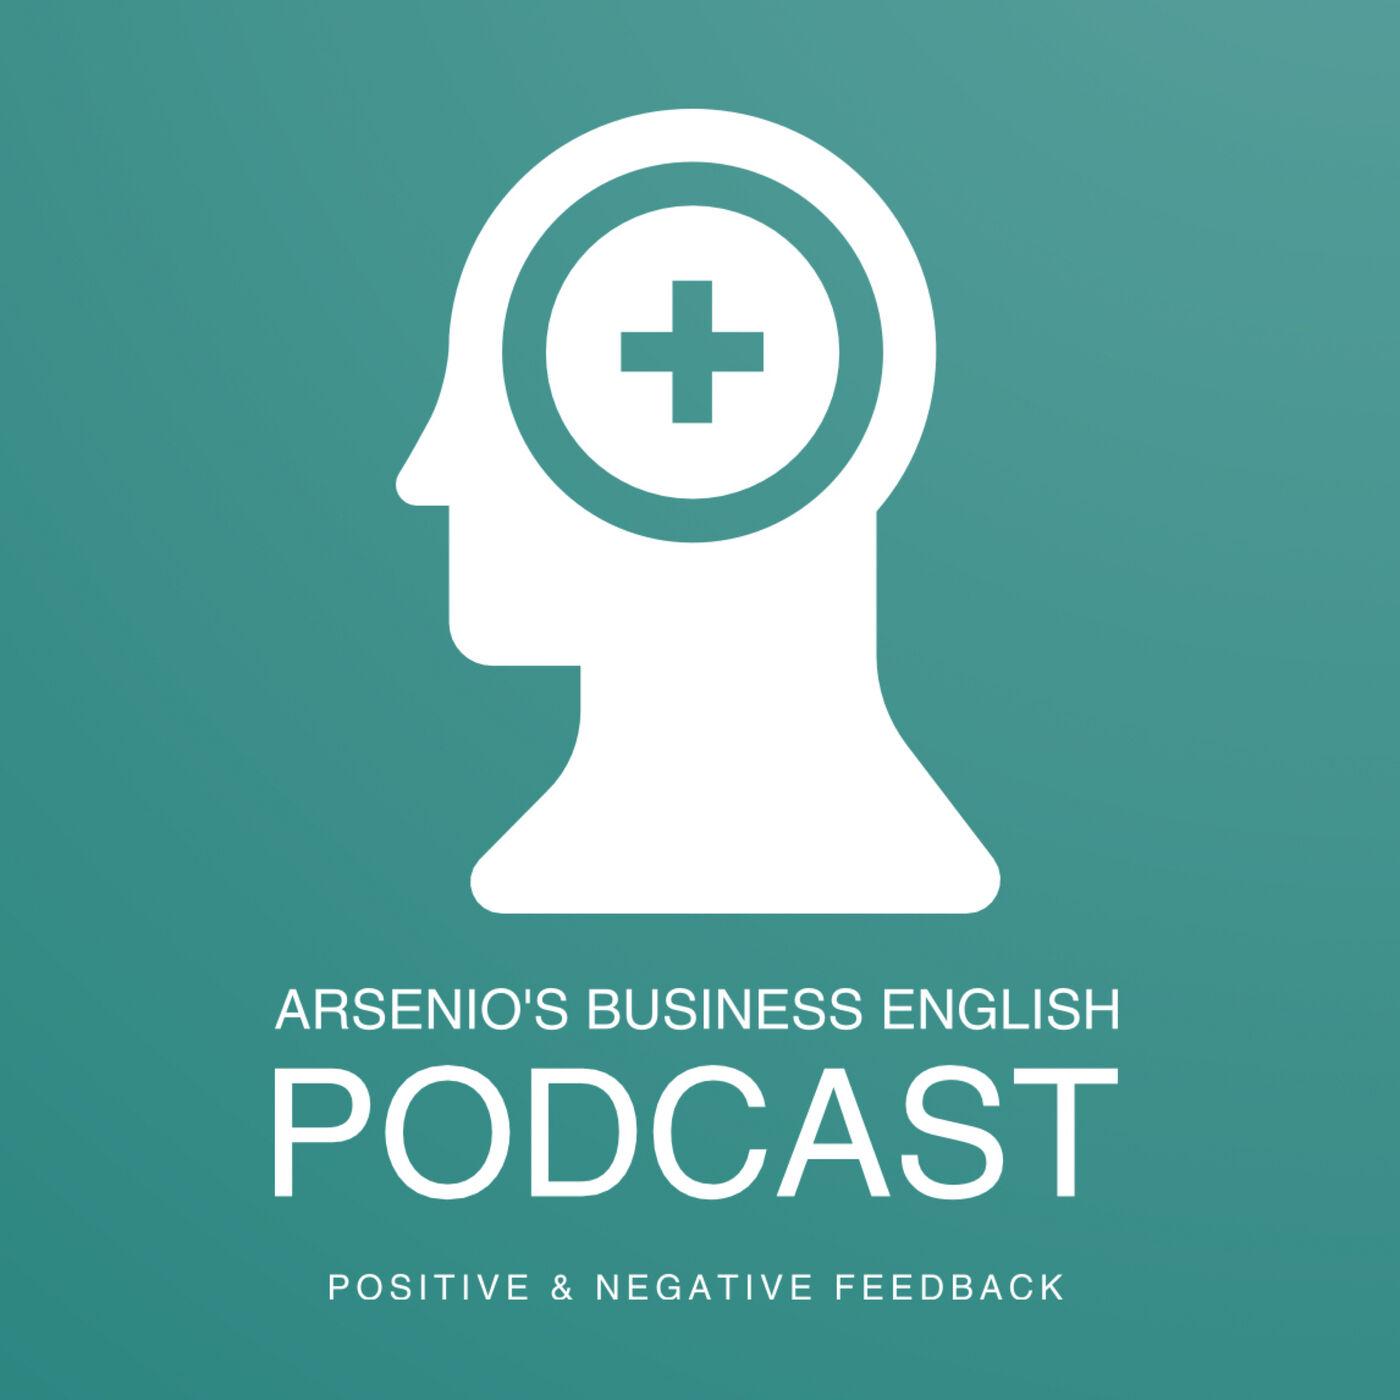 Arsenio's Business English Podcast | Season 6: Episode 34 | Positive & Negative Feedback: Workplace Scenario